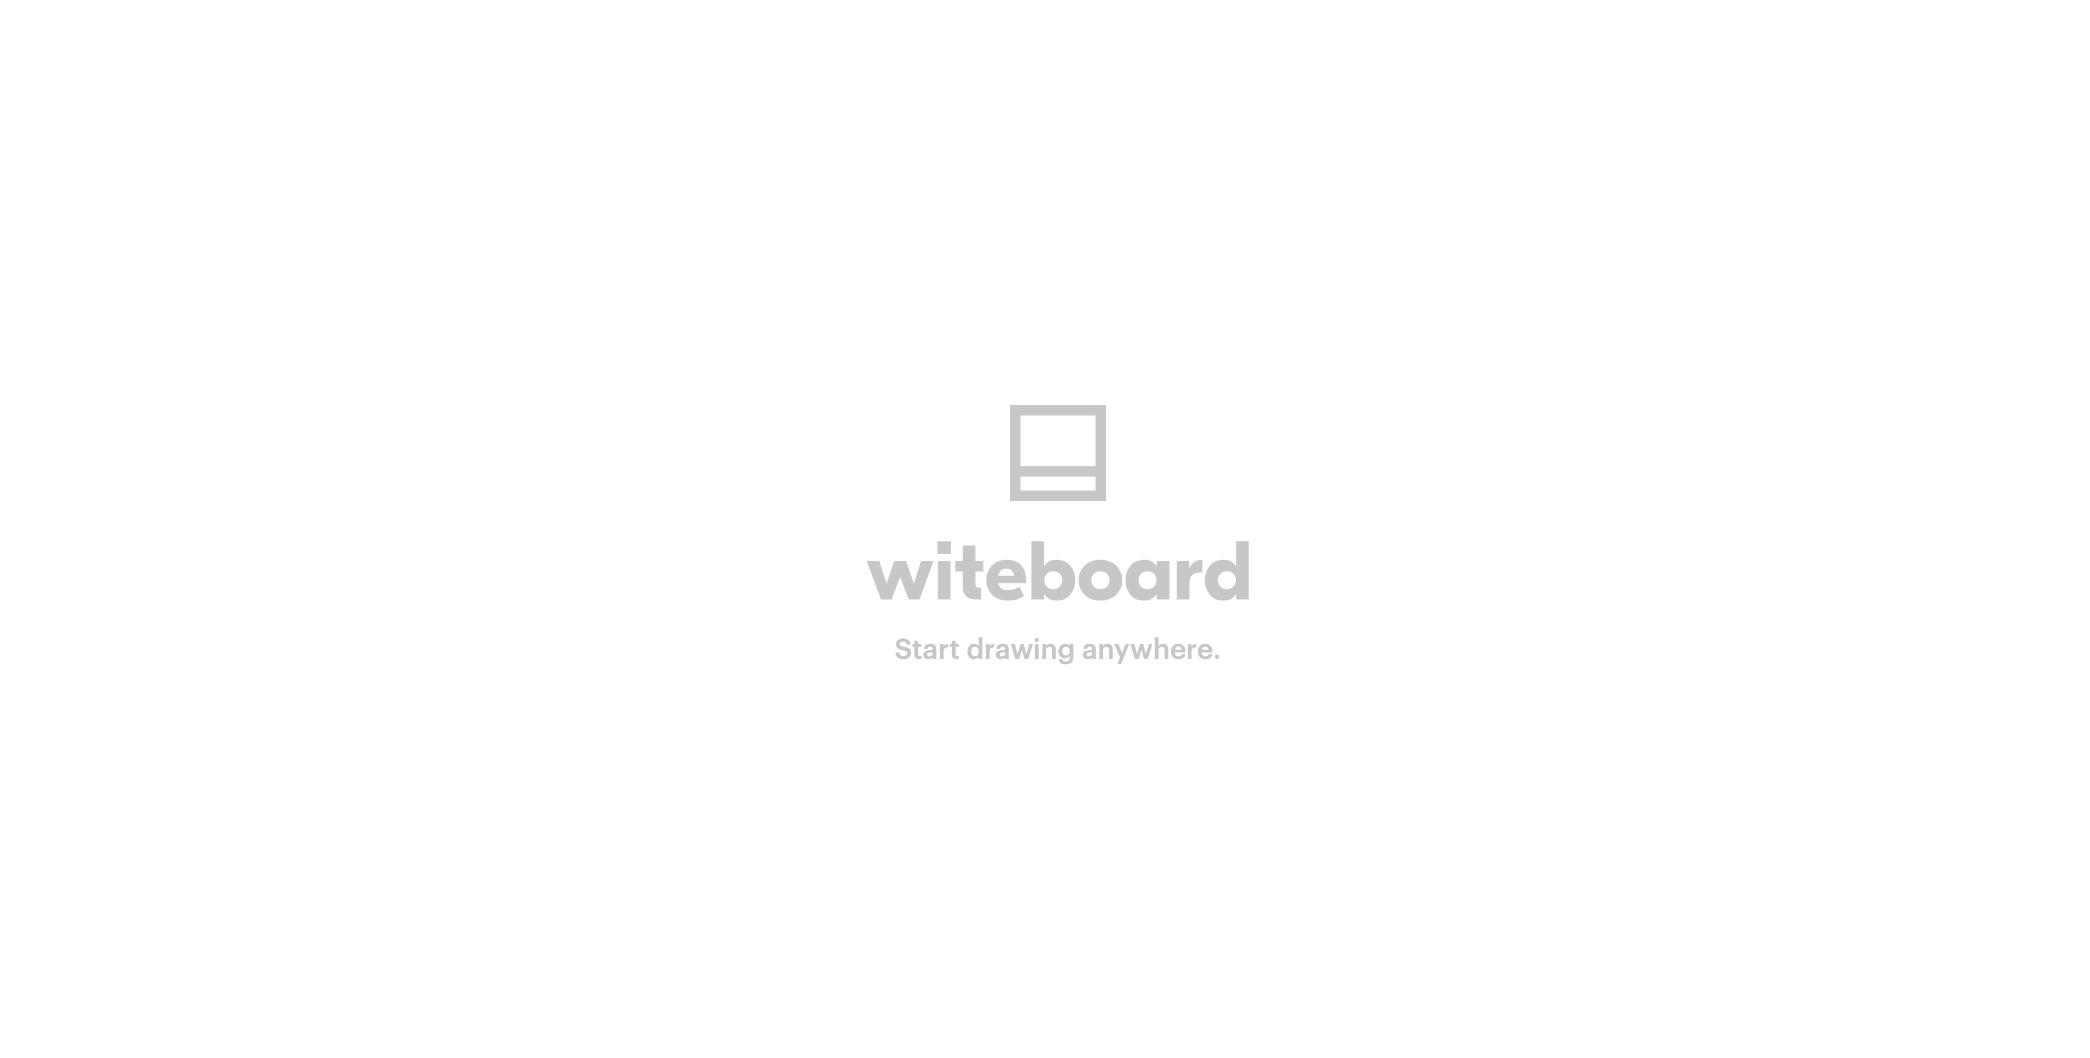 Witeboard Homepage